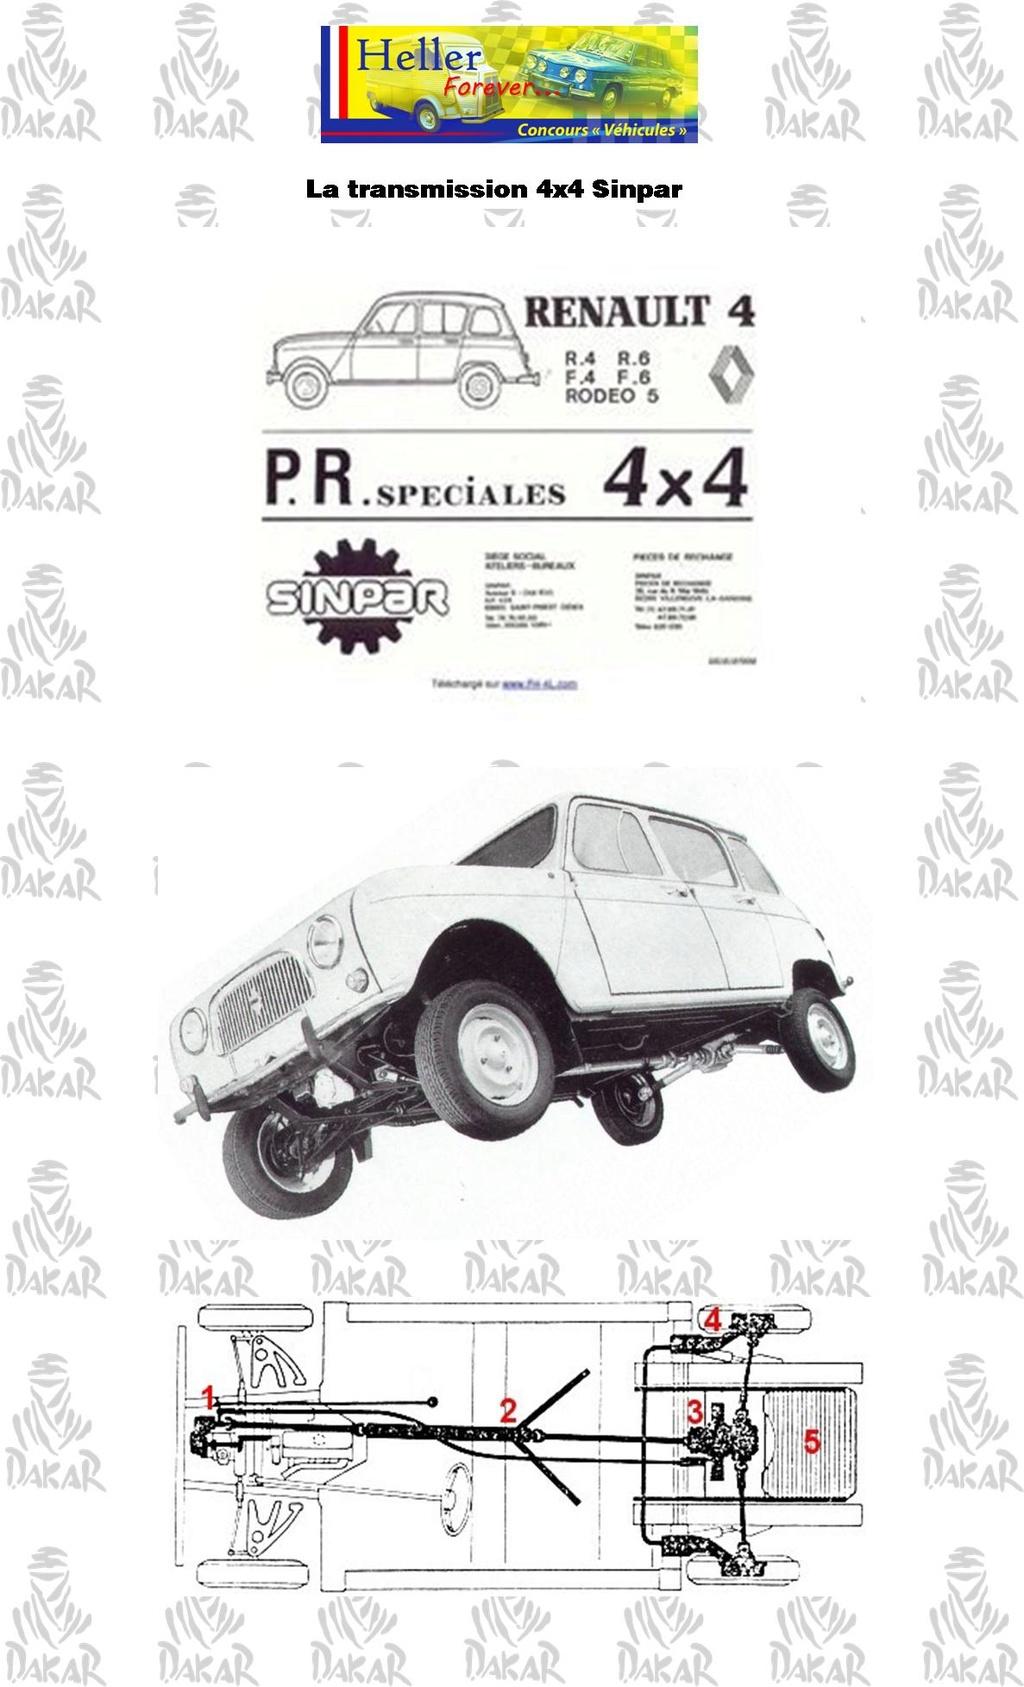 [1/24]Renault 4 l dakar 1980 Ref 80759 1510